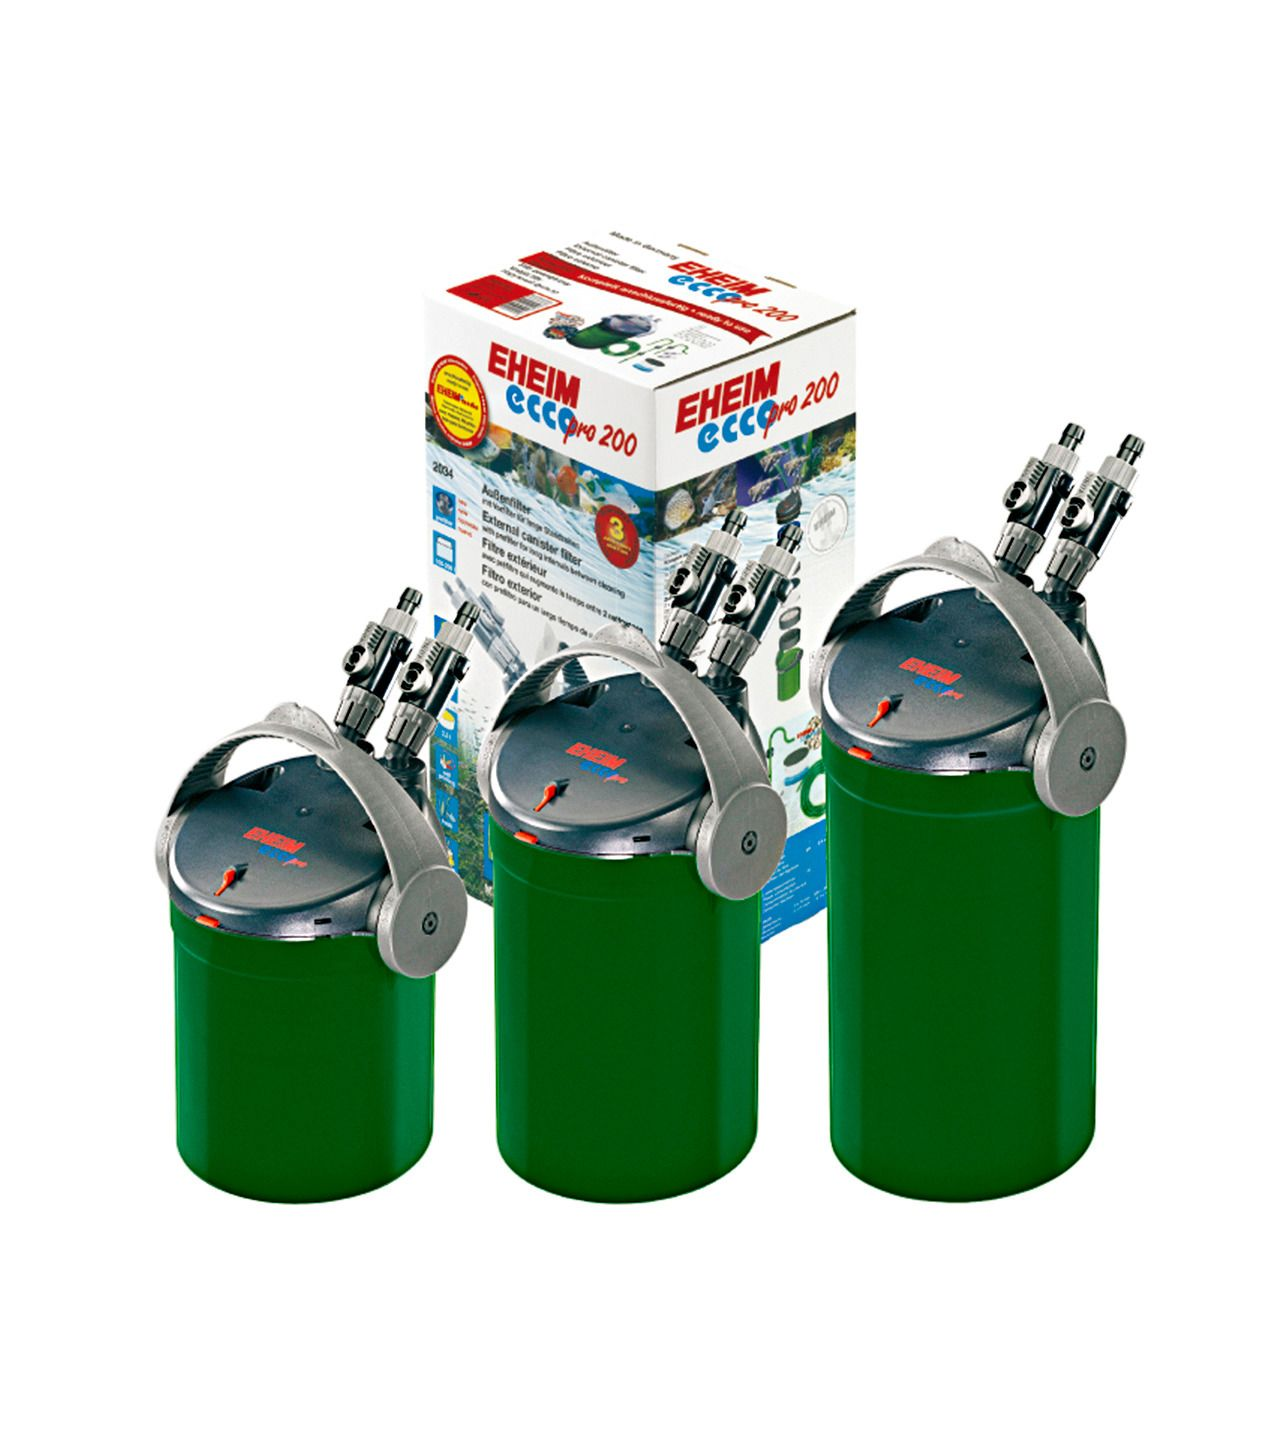 EHEIM Aquarienfilter »Energiesparfilter EccoPro«